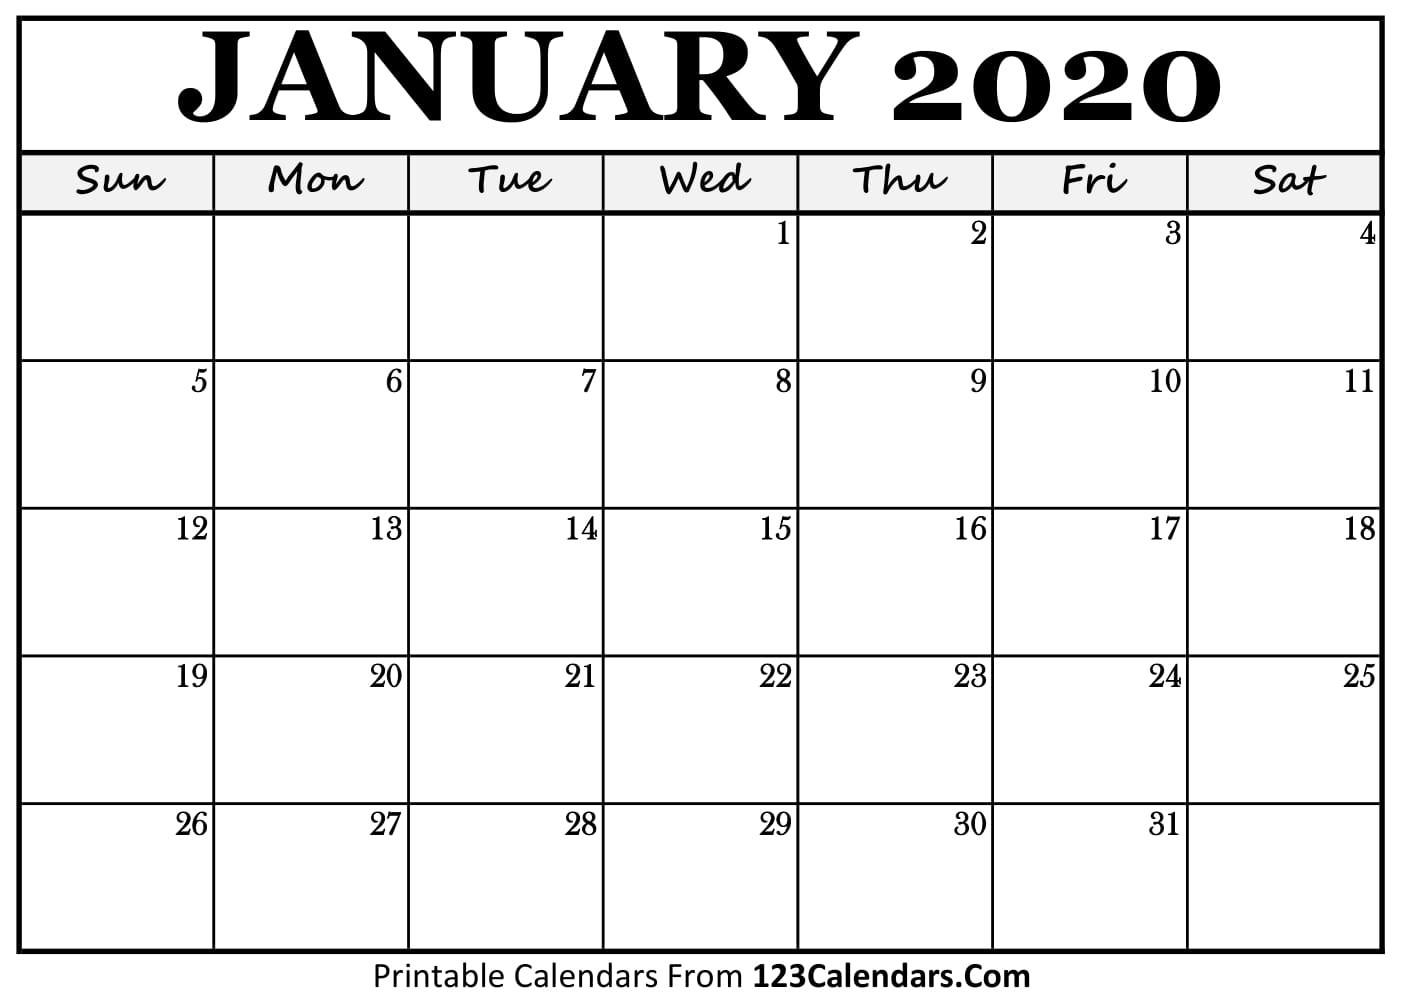 Free Printable Calendar | 123Calendars  Free Printable Monthly Calendar Template